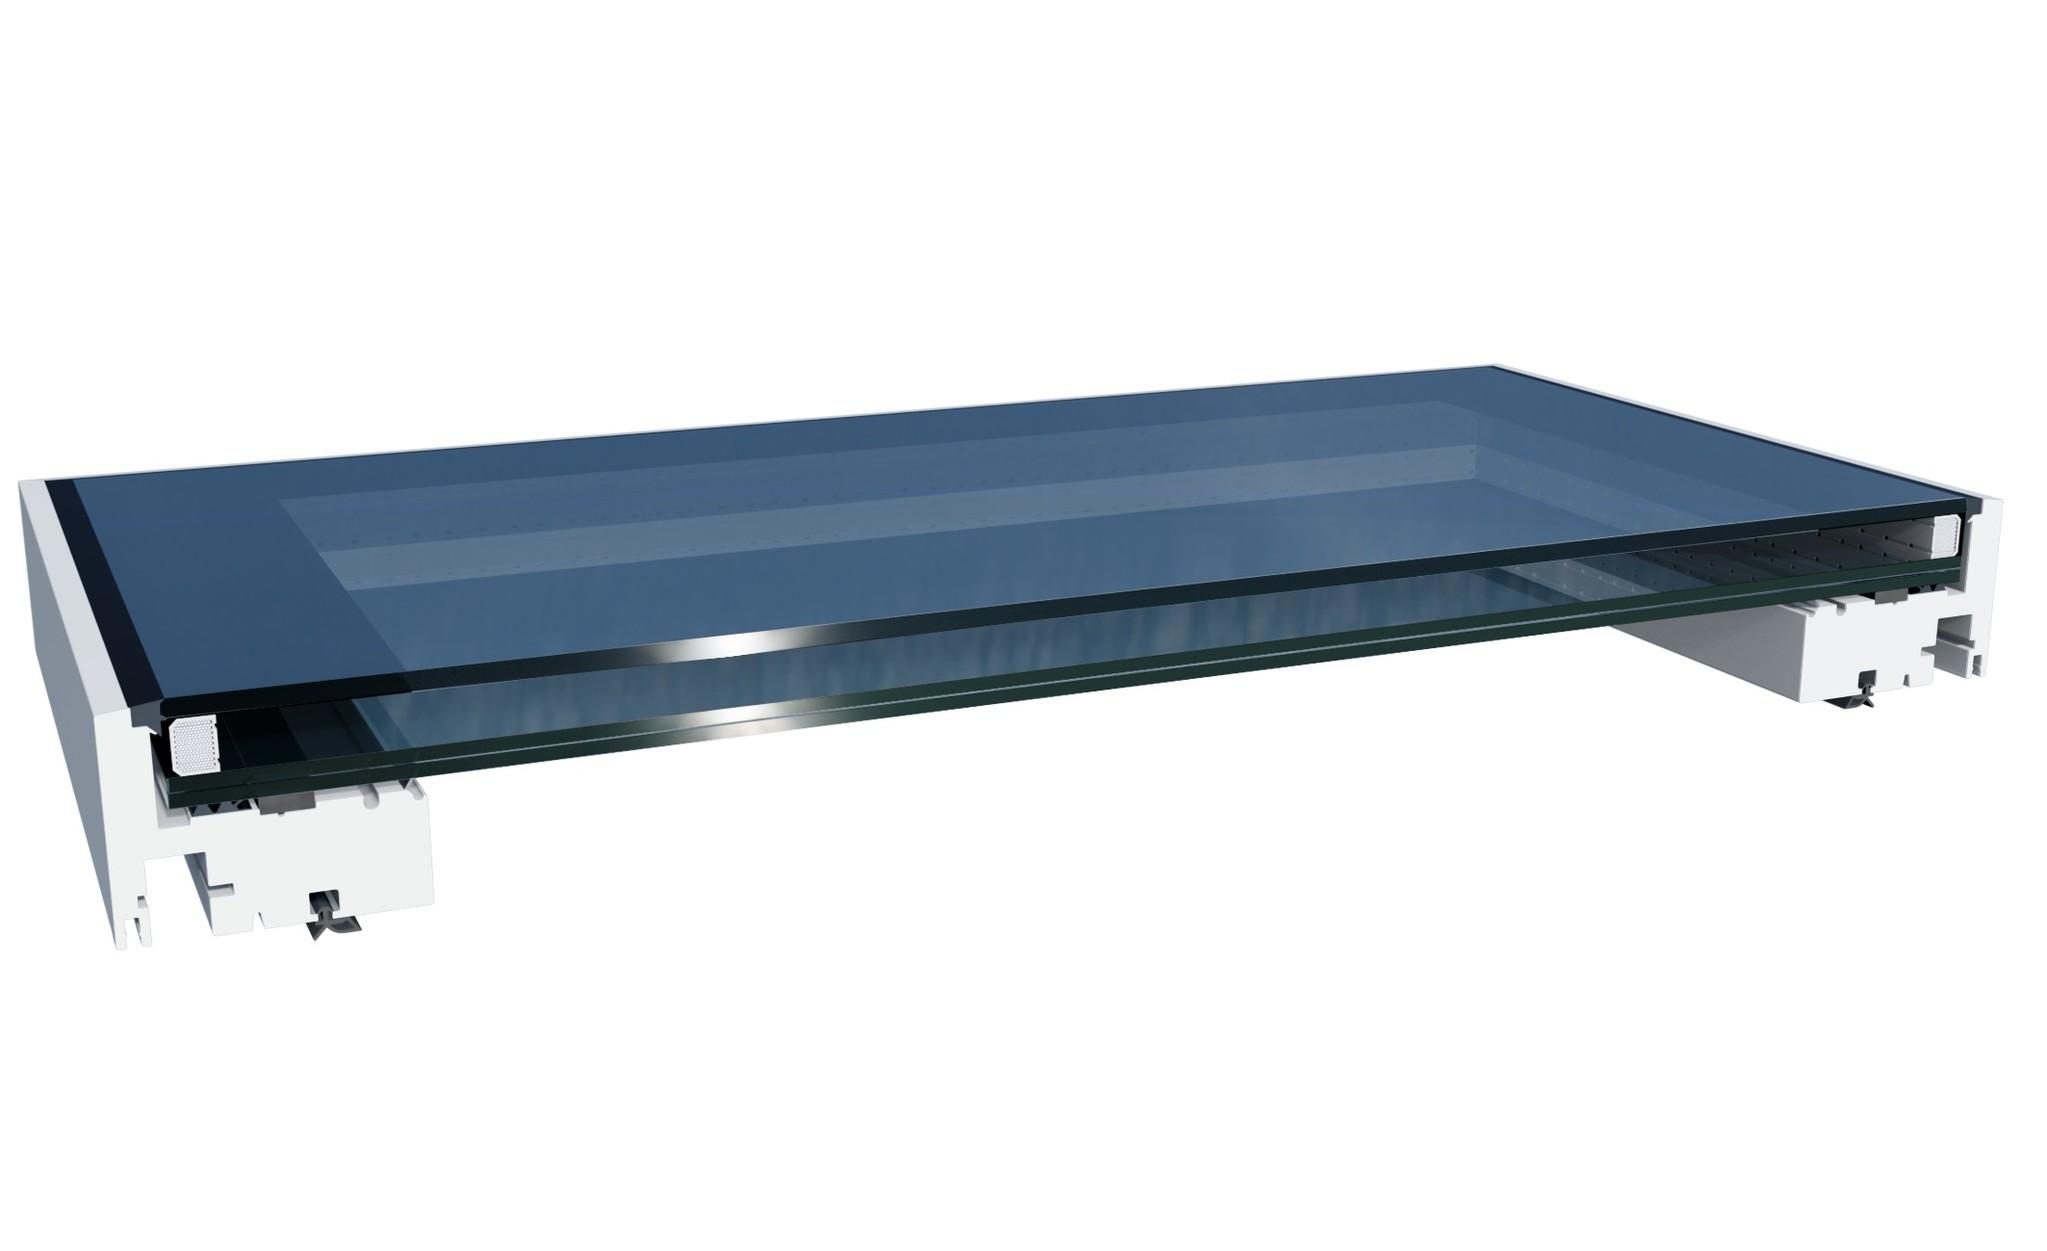 Intura - Lichtkoepel renovatiemodule Intura DGP A1 80x130cm - upgrade oude lichtkoepels - Copy